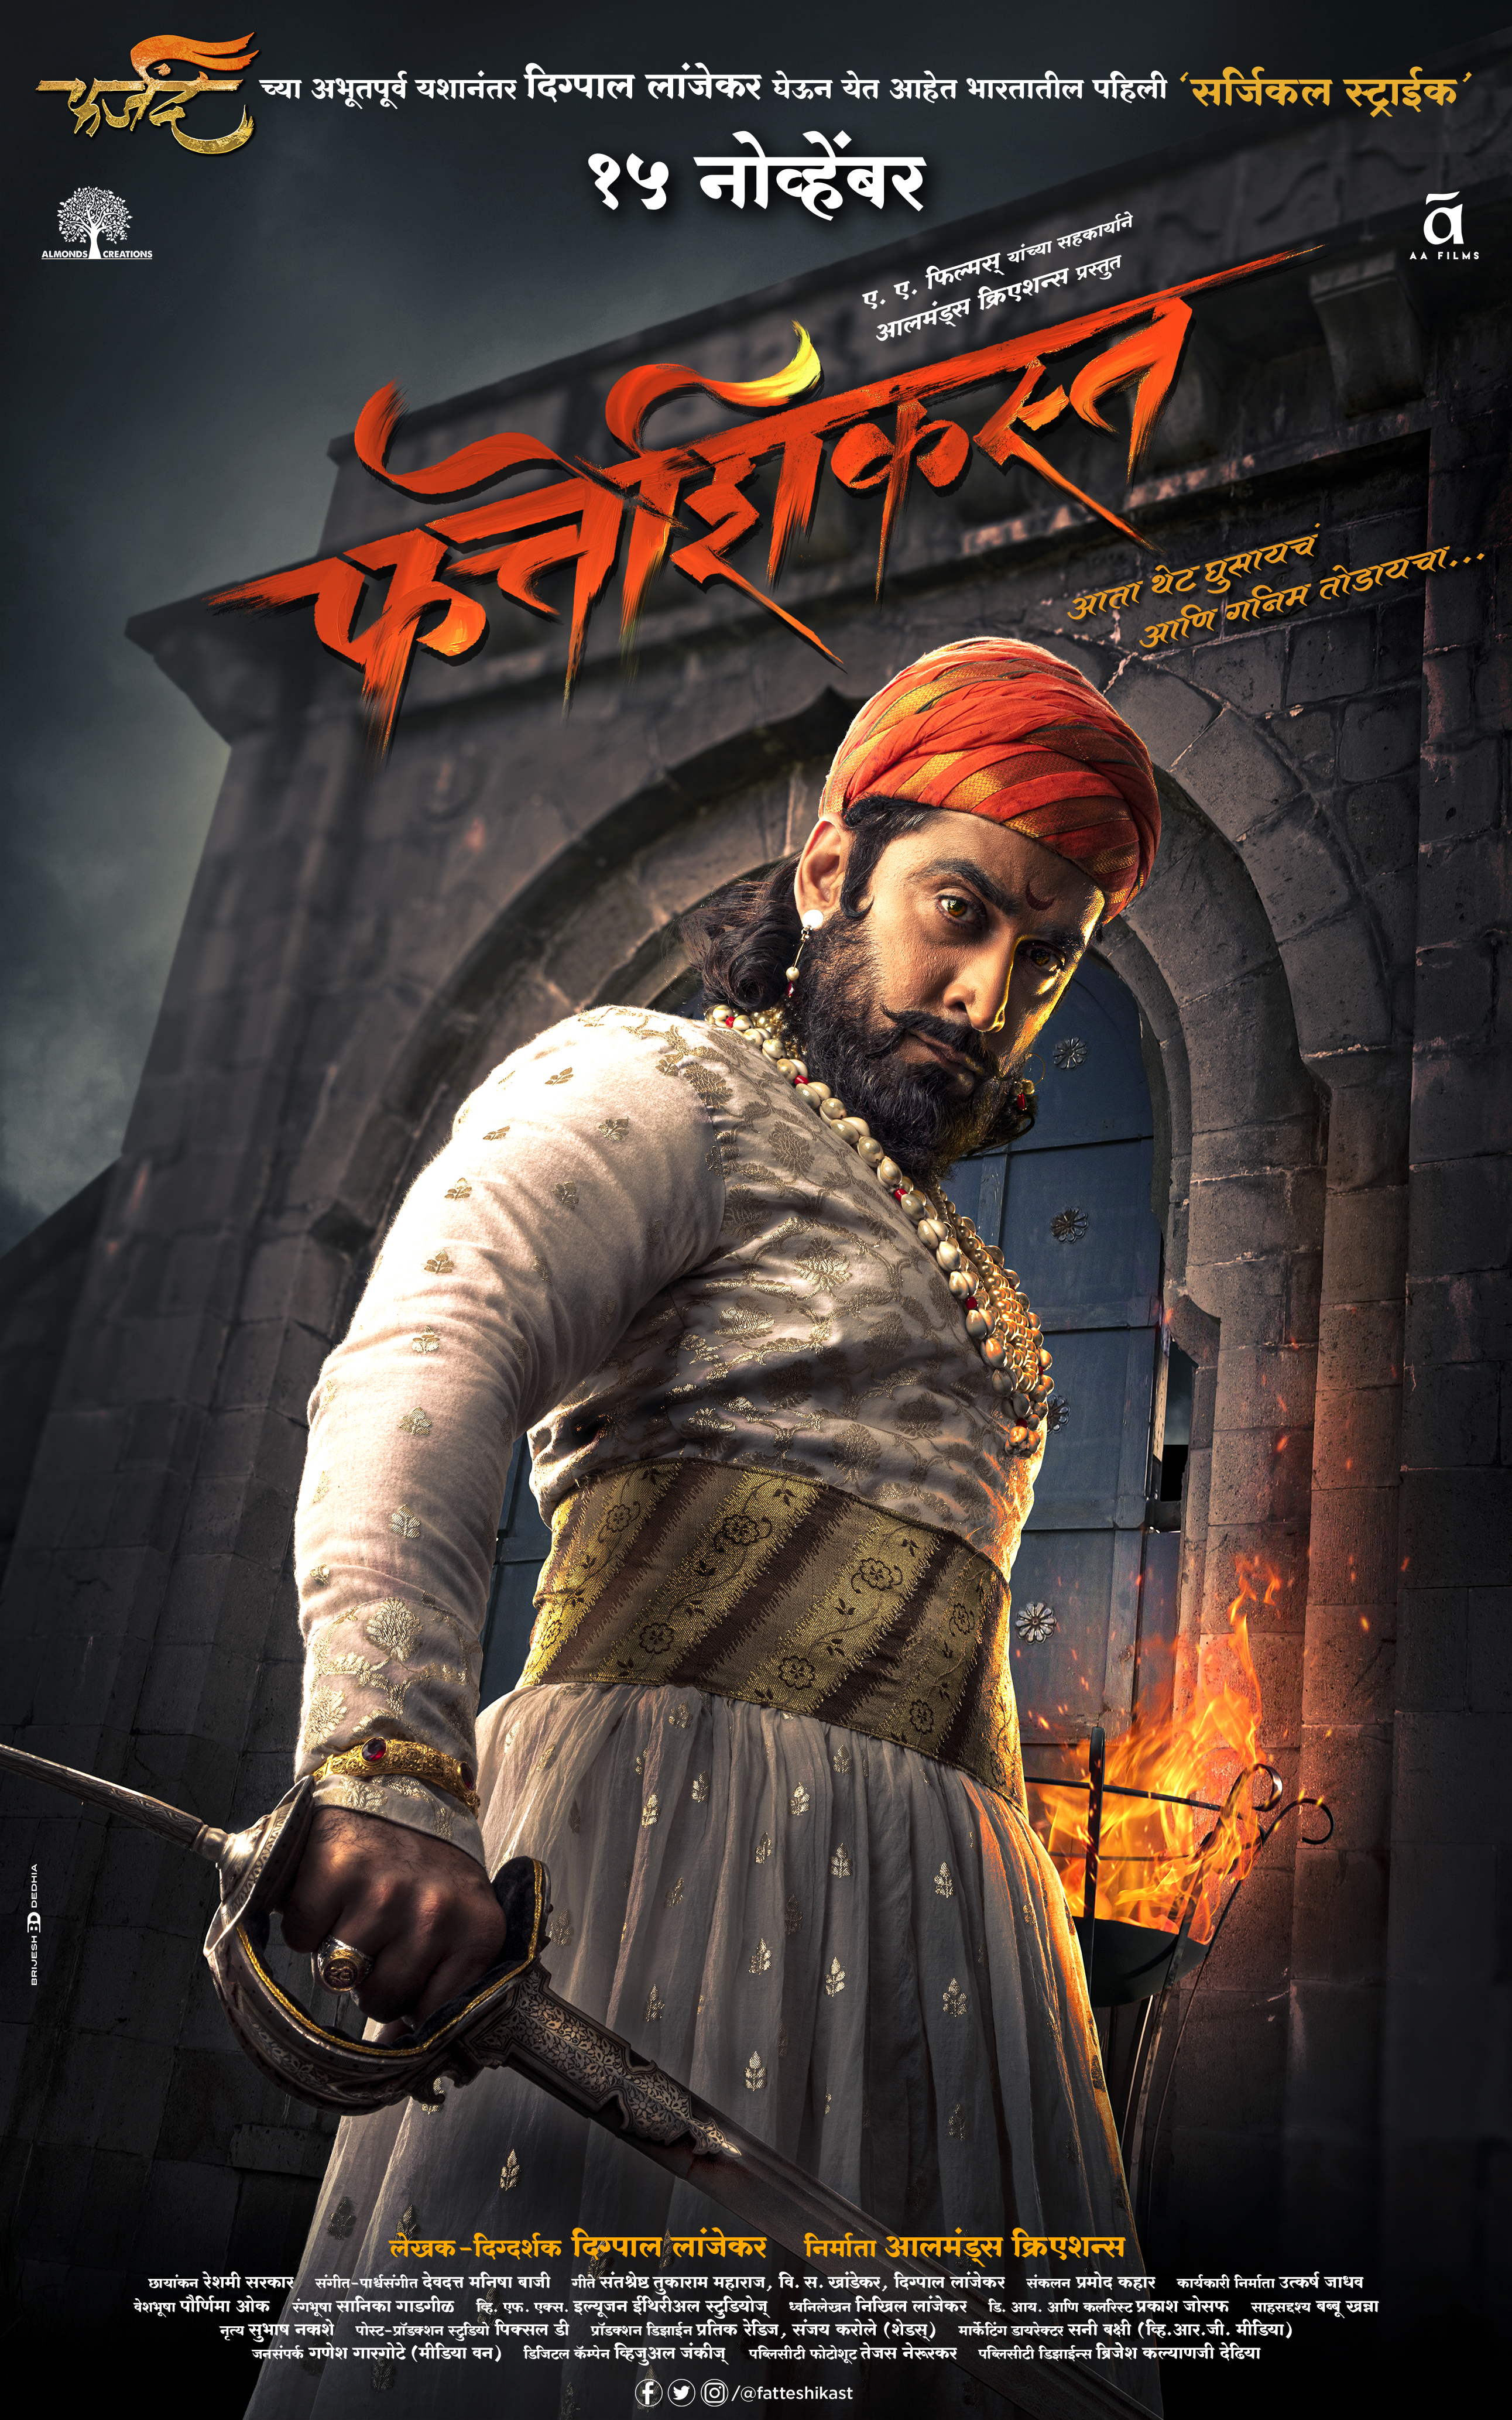 Fatteshikast 2019 Marathi Full Movie 450MB HDRip ESub Download